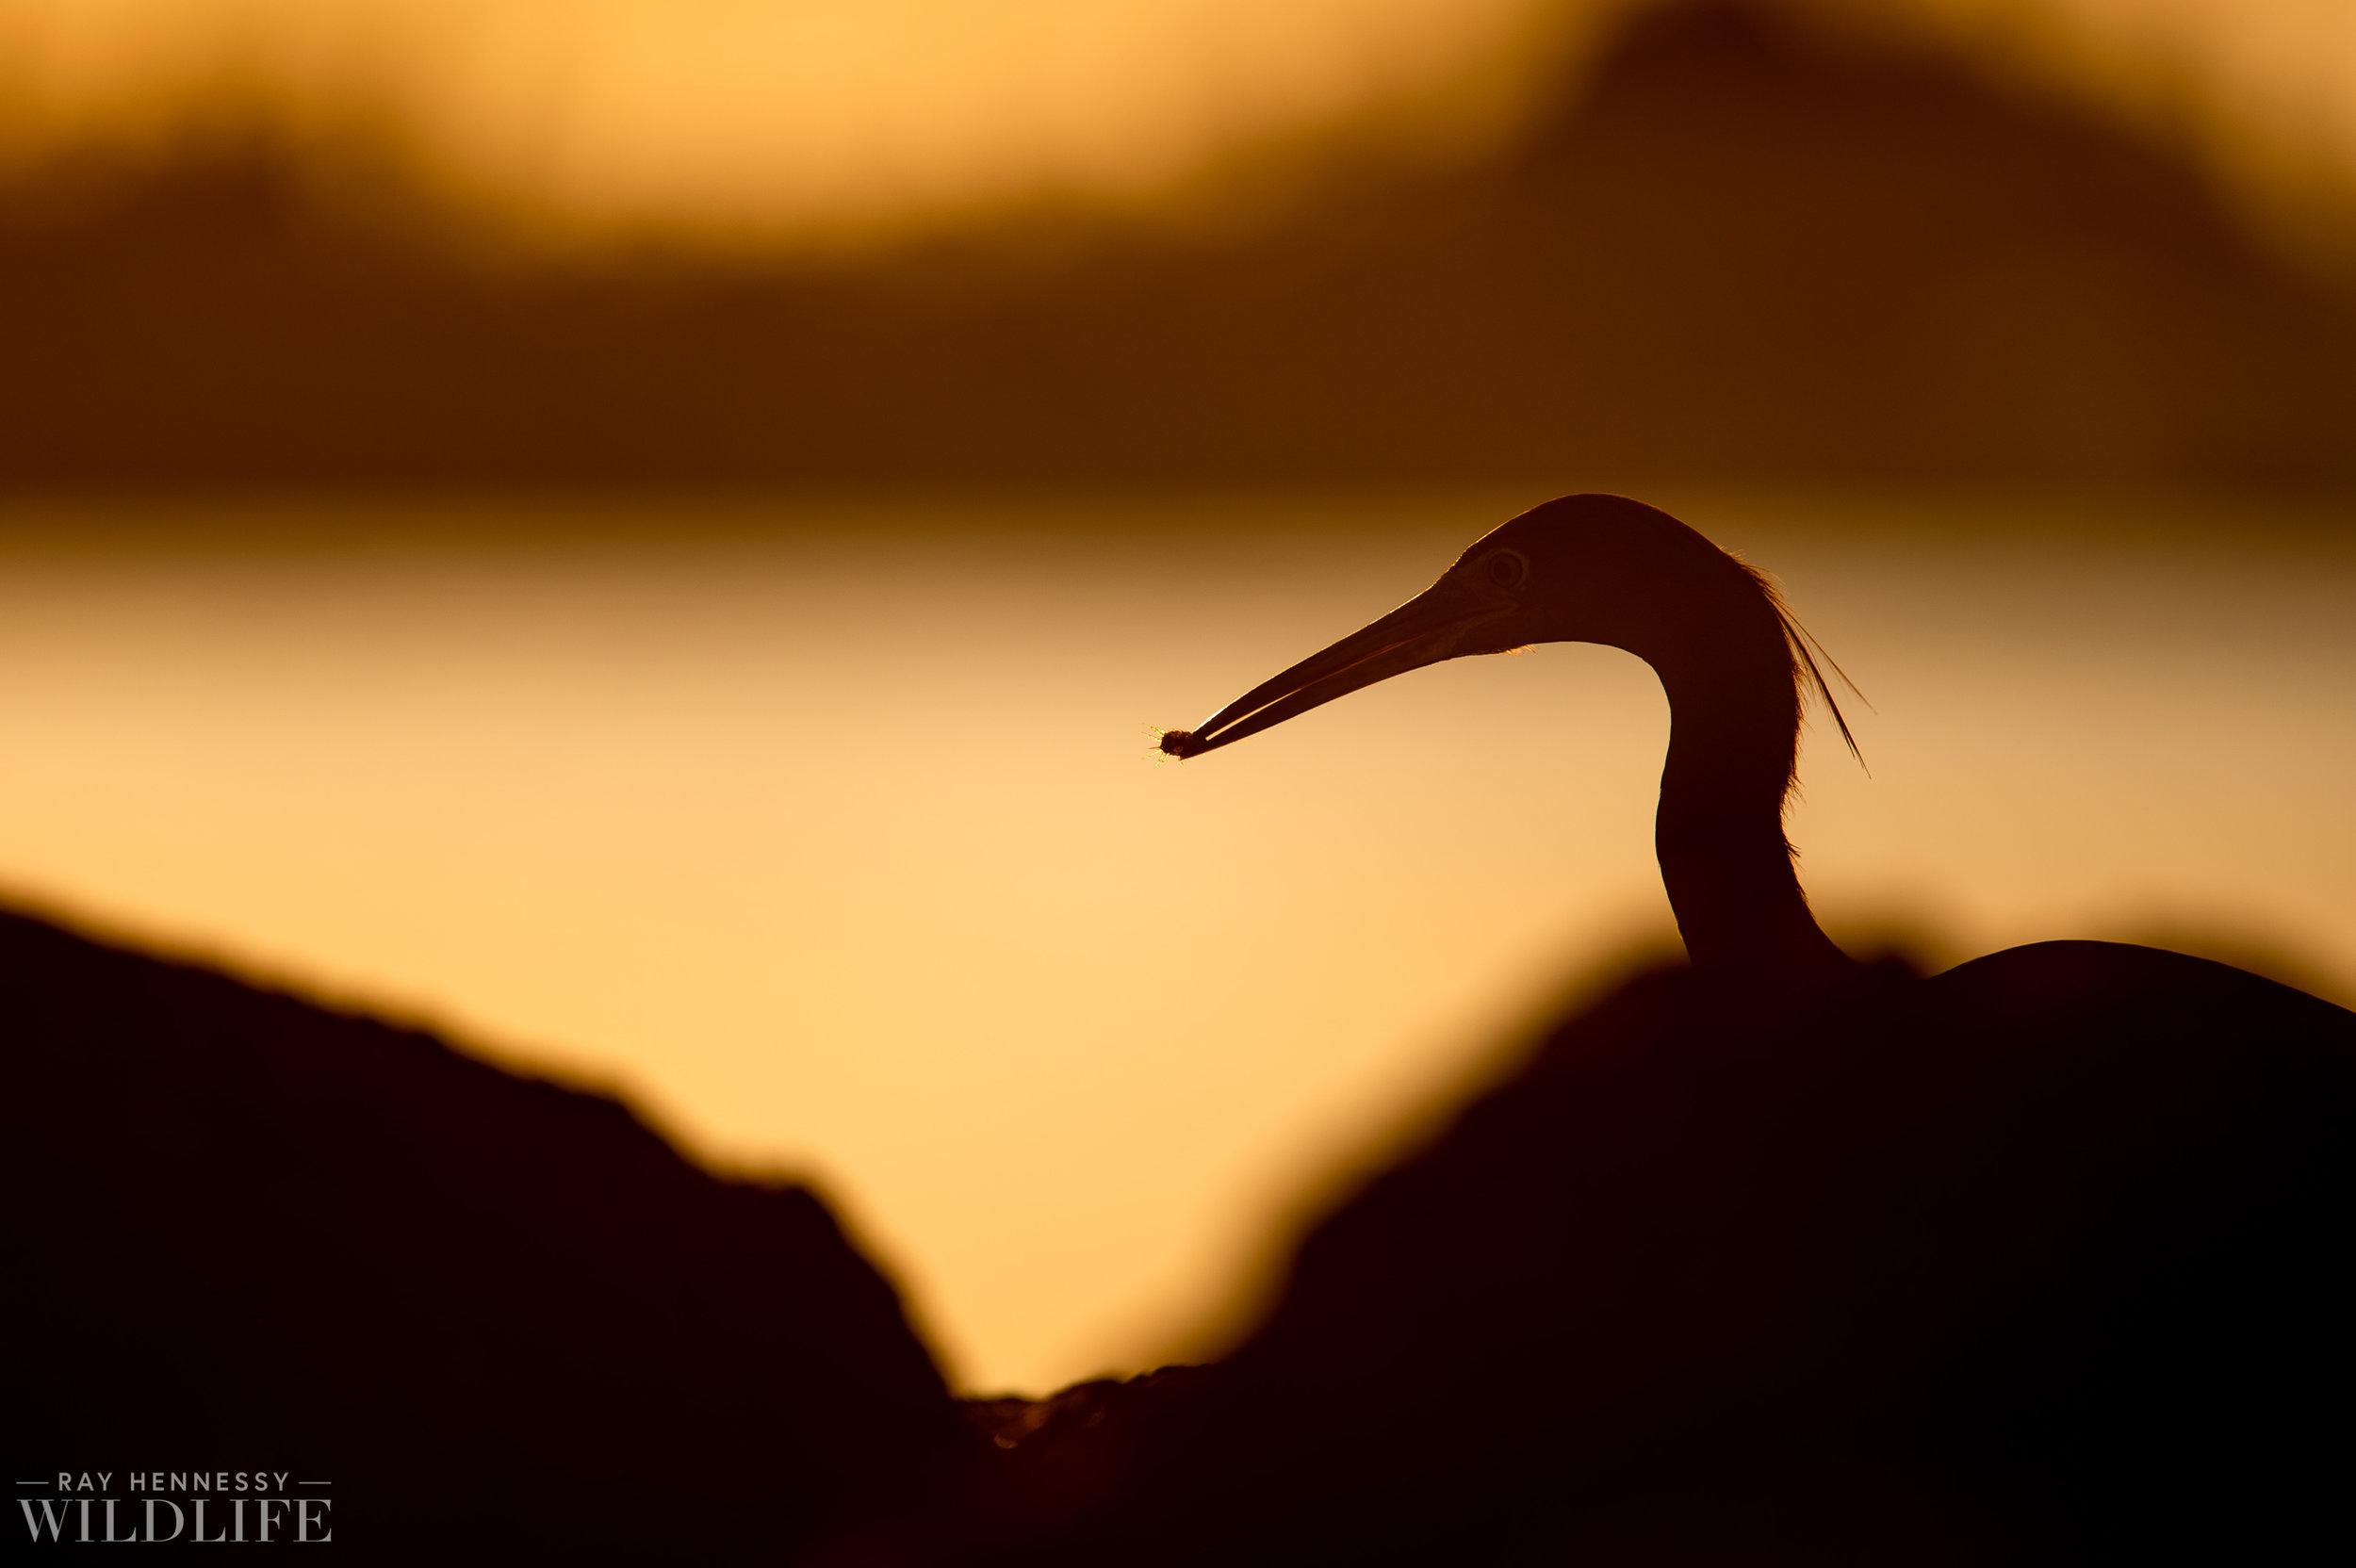 005_little-blue-heron.jpg